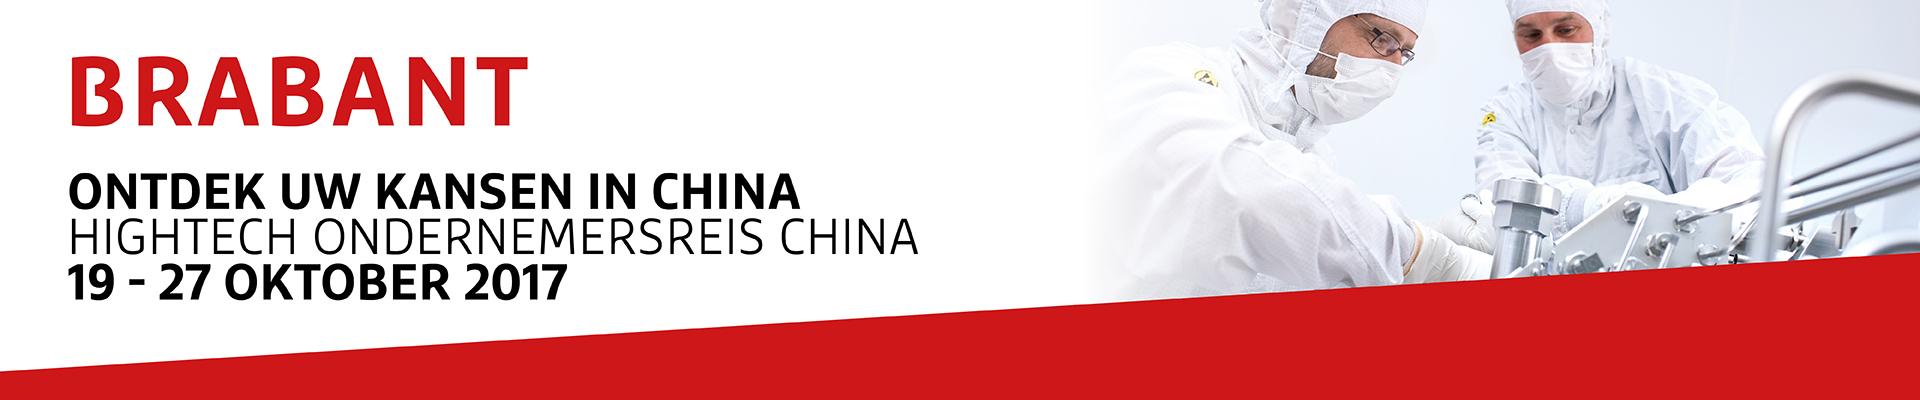 Hightech ondernemersreis China FI Trade